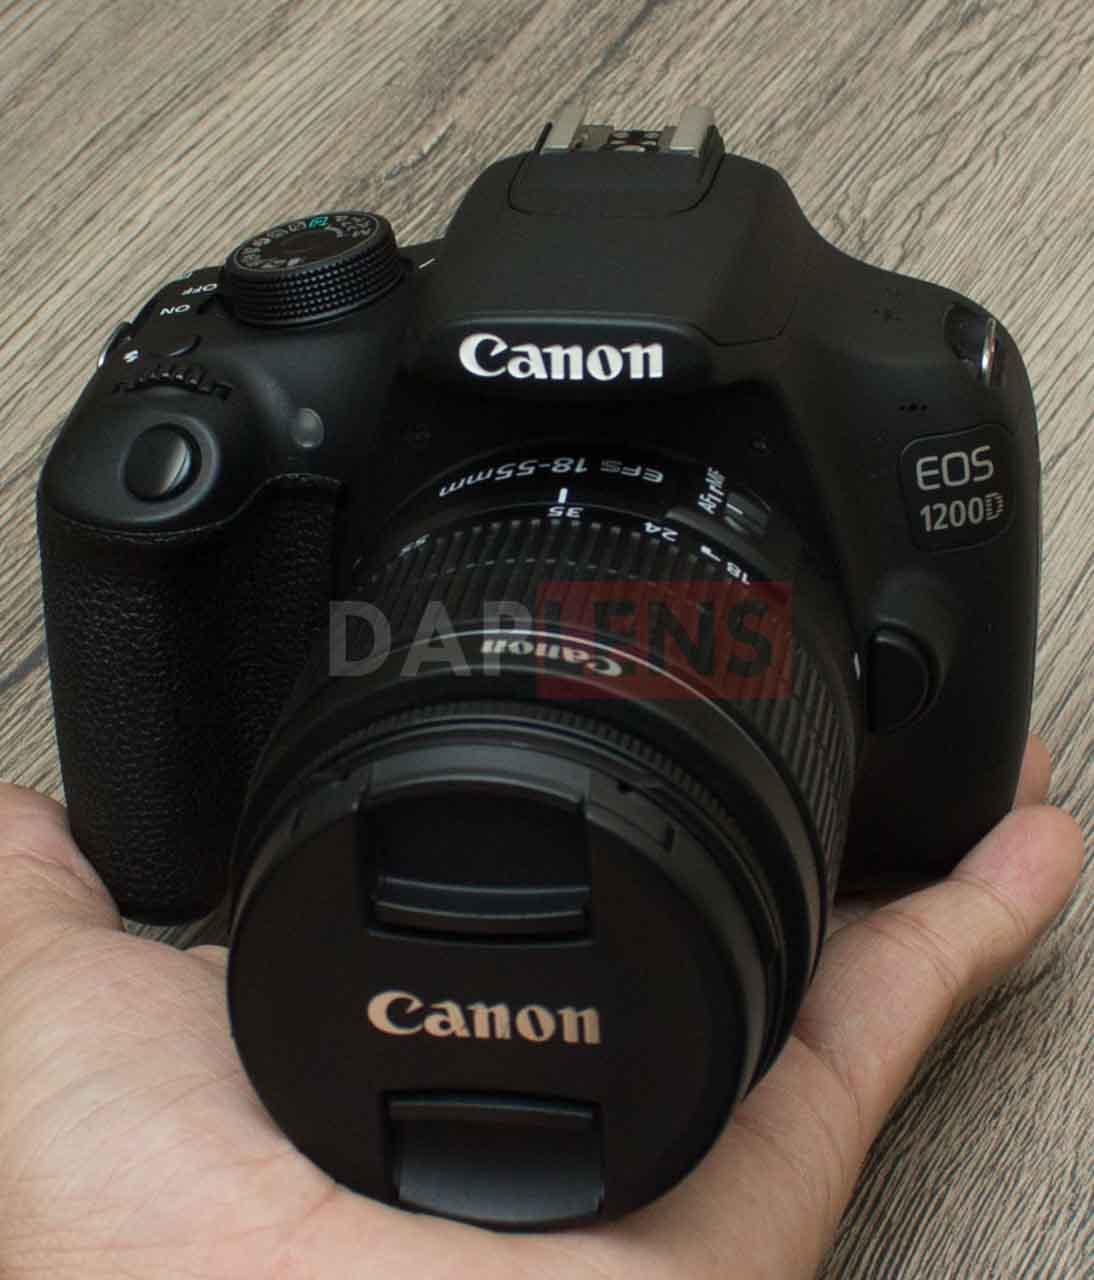 Daplens Canon Eos 1200d Kit 18 55mm Iii Mulus Bonus Tas Lensa Kamera